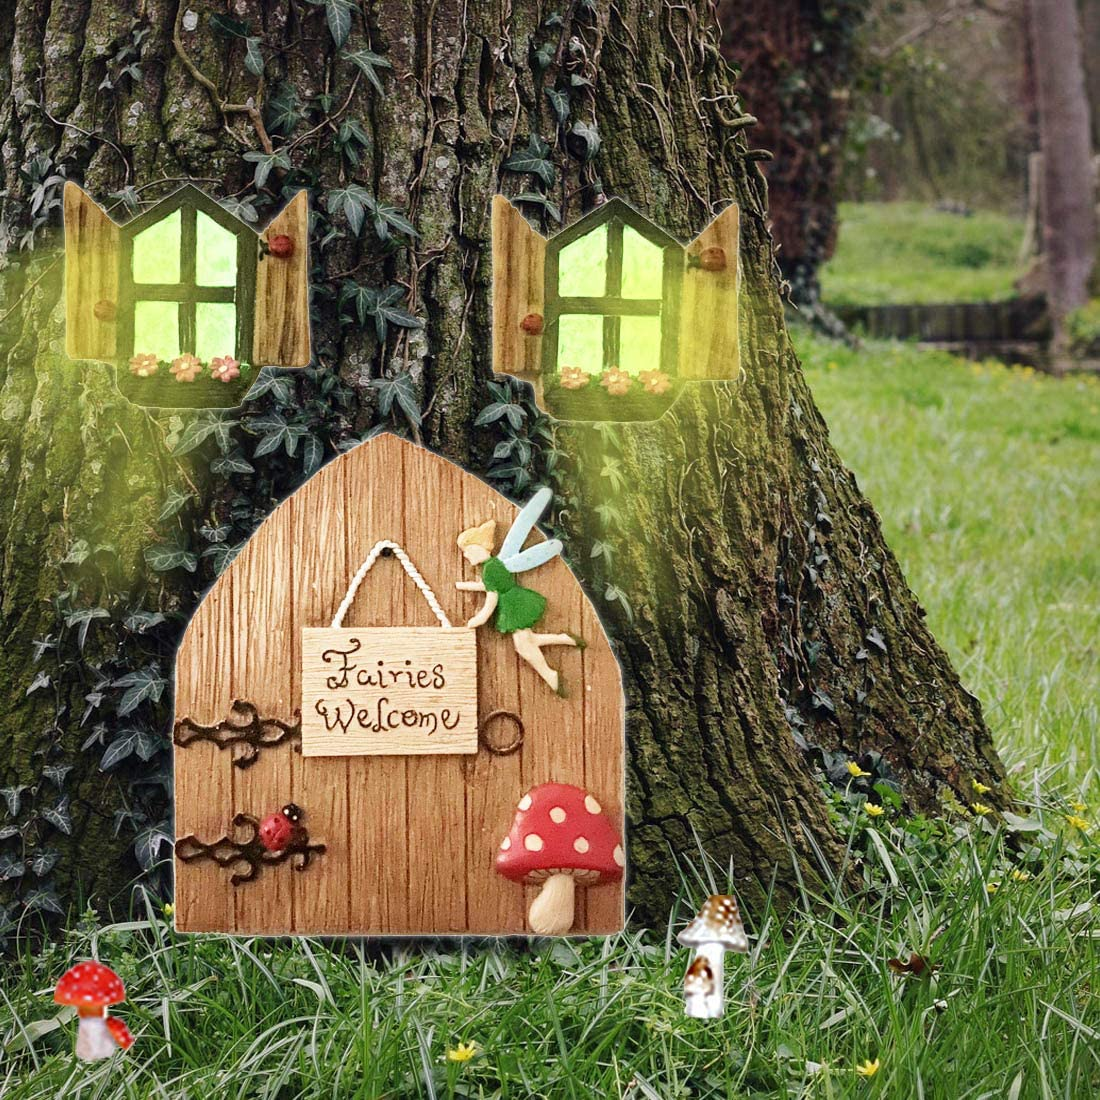 Fairy Doors for Tree Outdoor Decorations Garden Decorations Outdoor Garden Doors and Windows Gnome House Window and Door for Trees, Garden Decor Fairy Garden Accessories Outdoor Decorations